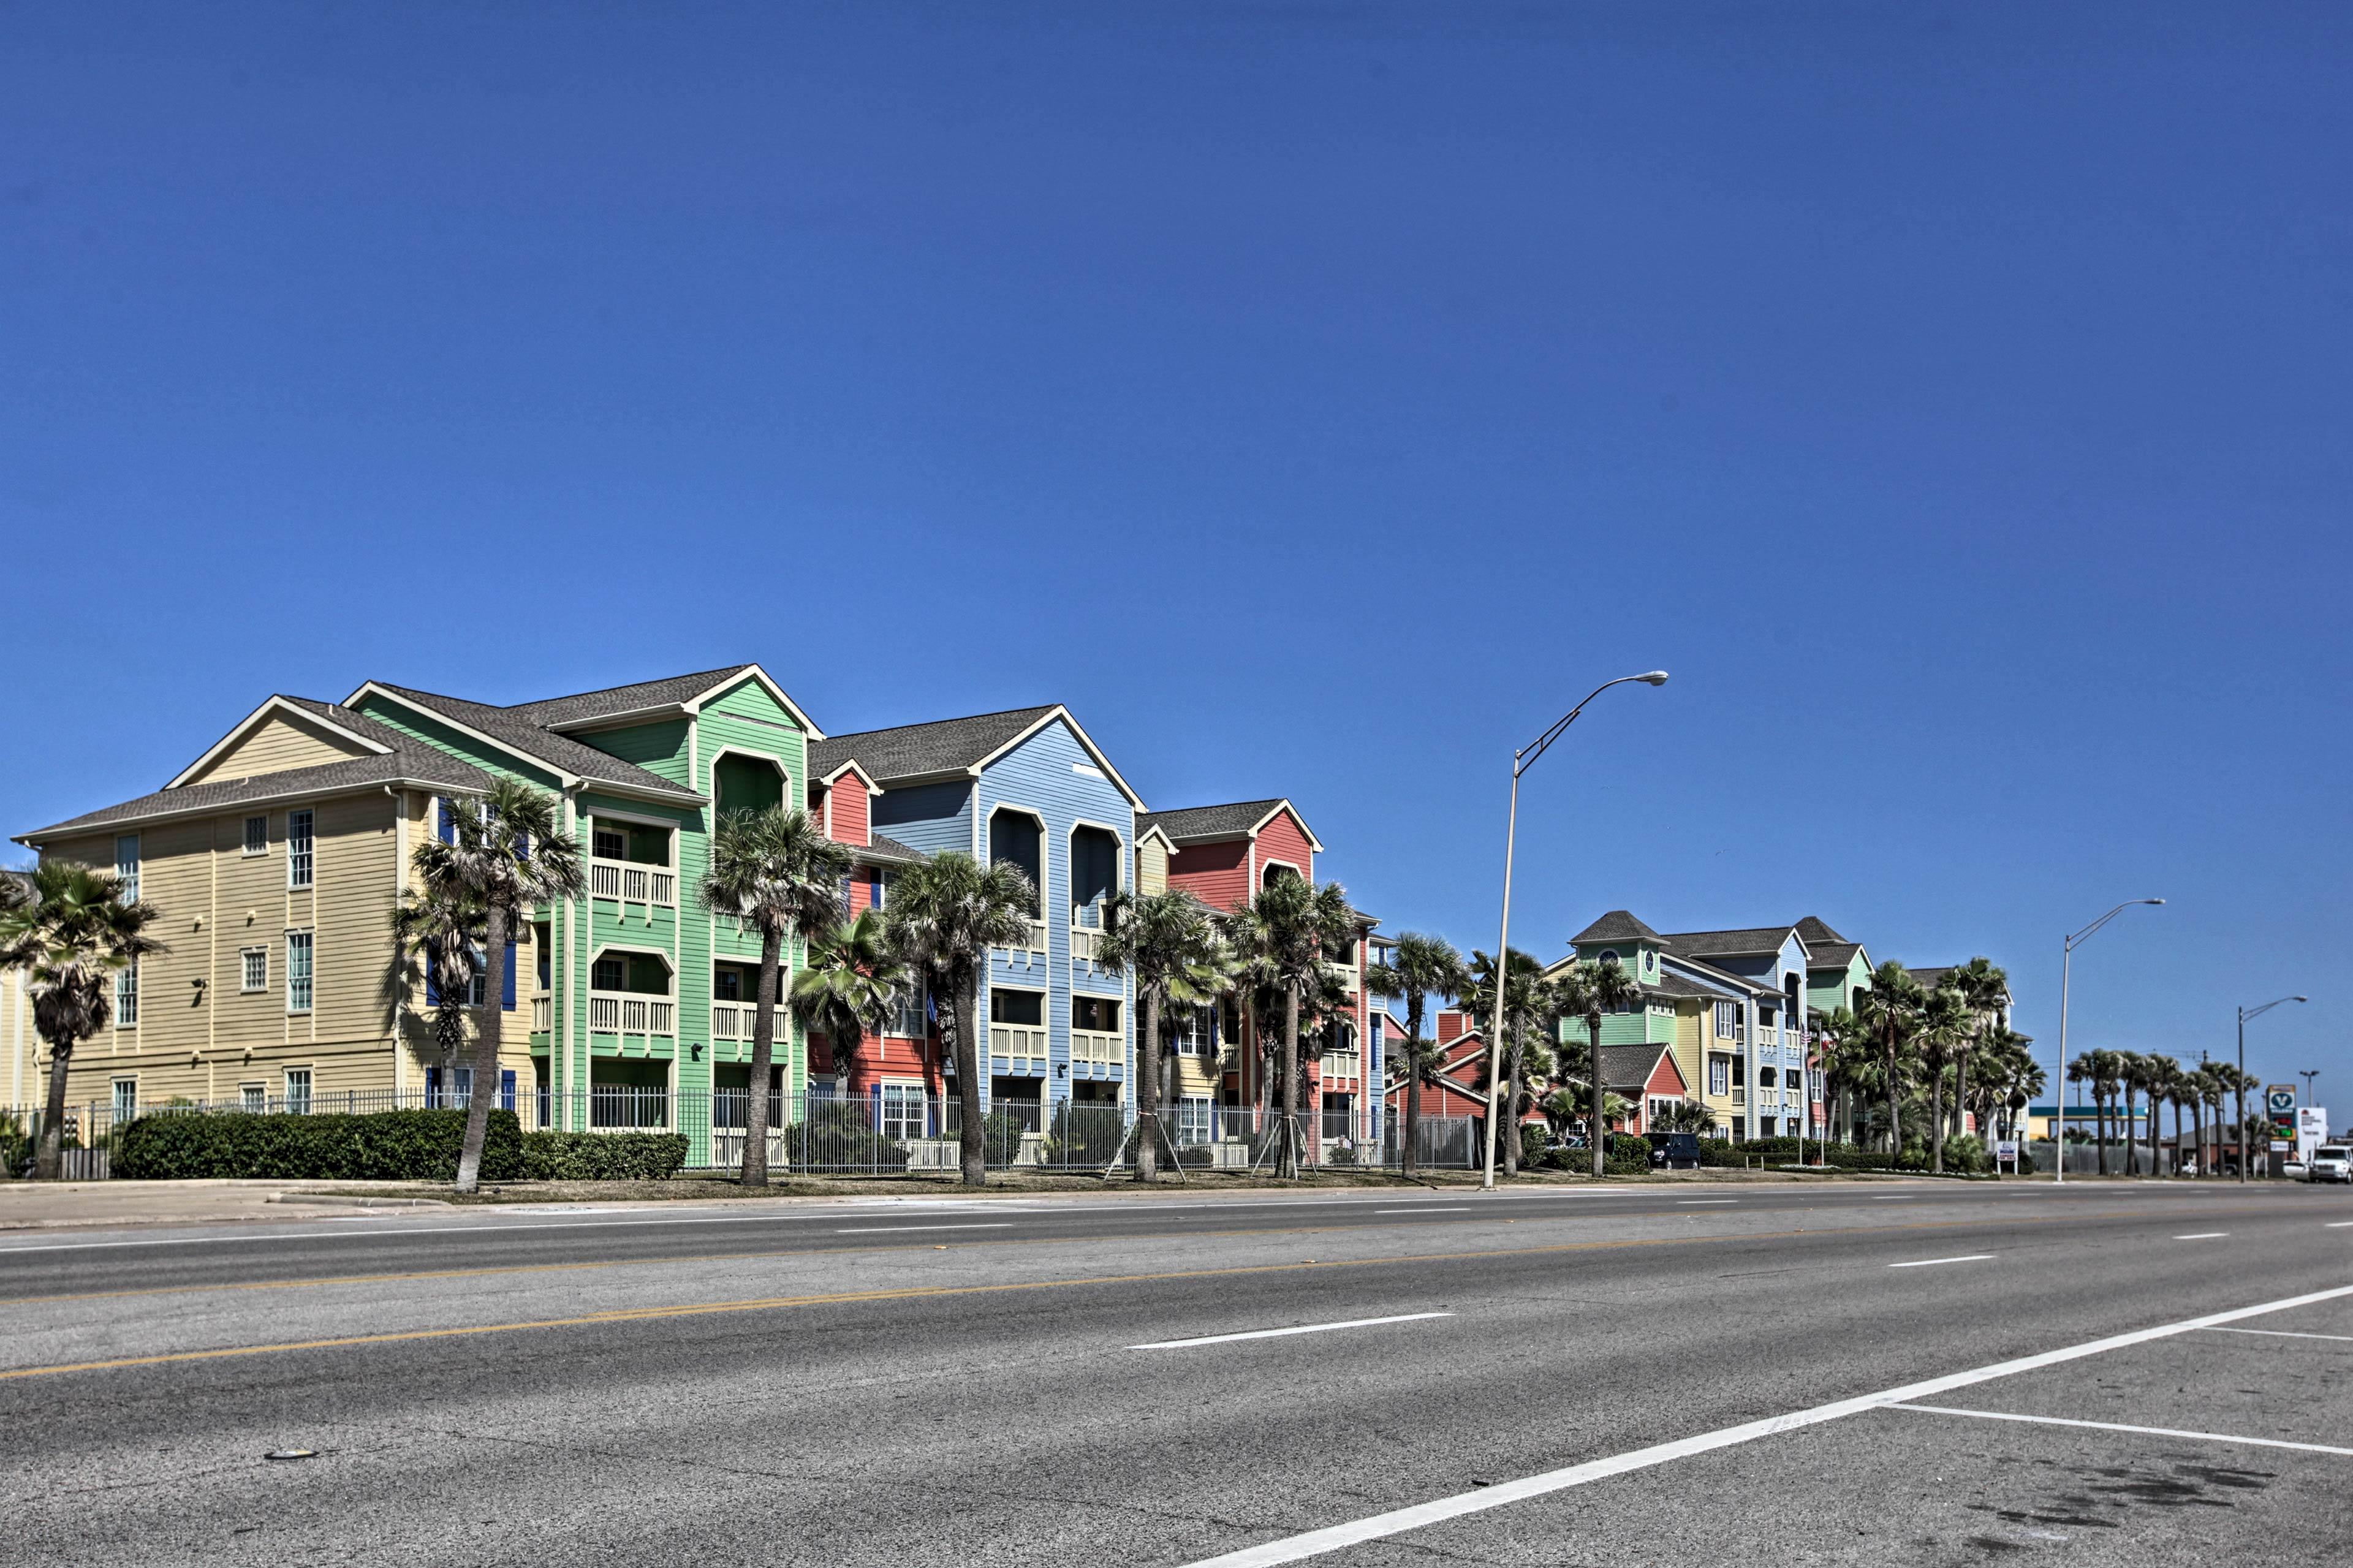 Your tropical paradise awaits in Galveston, Texas!